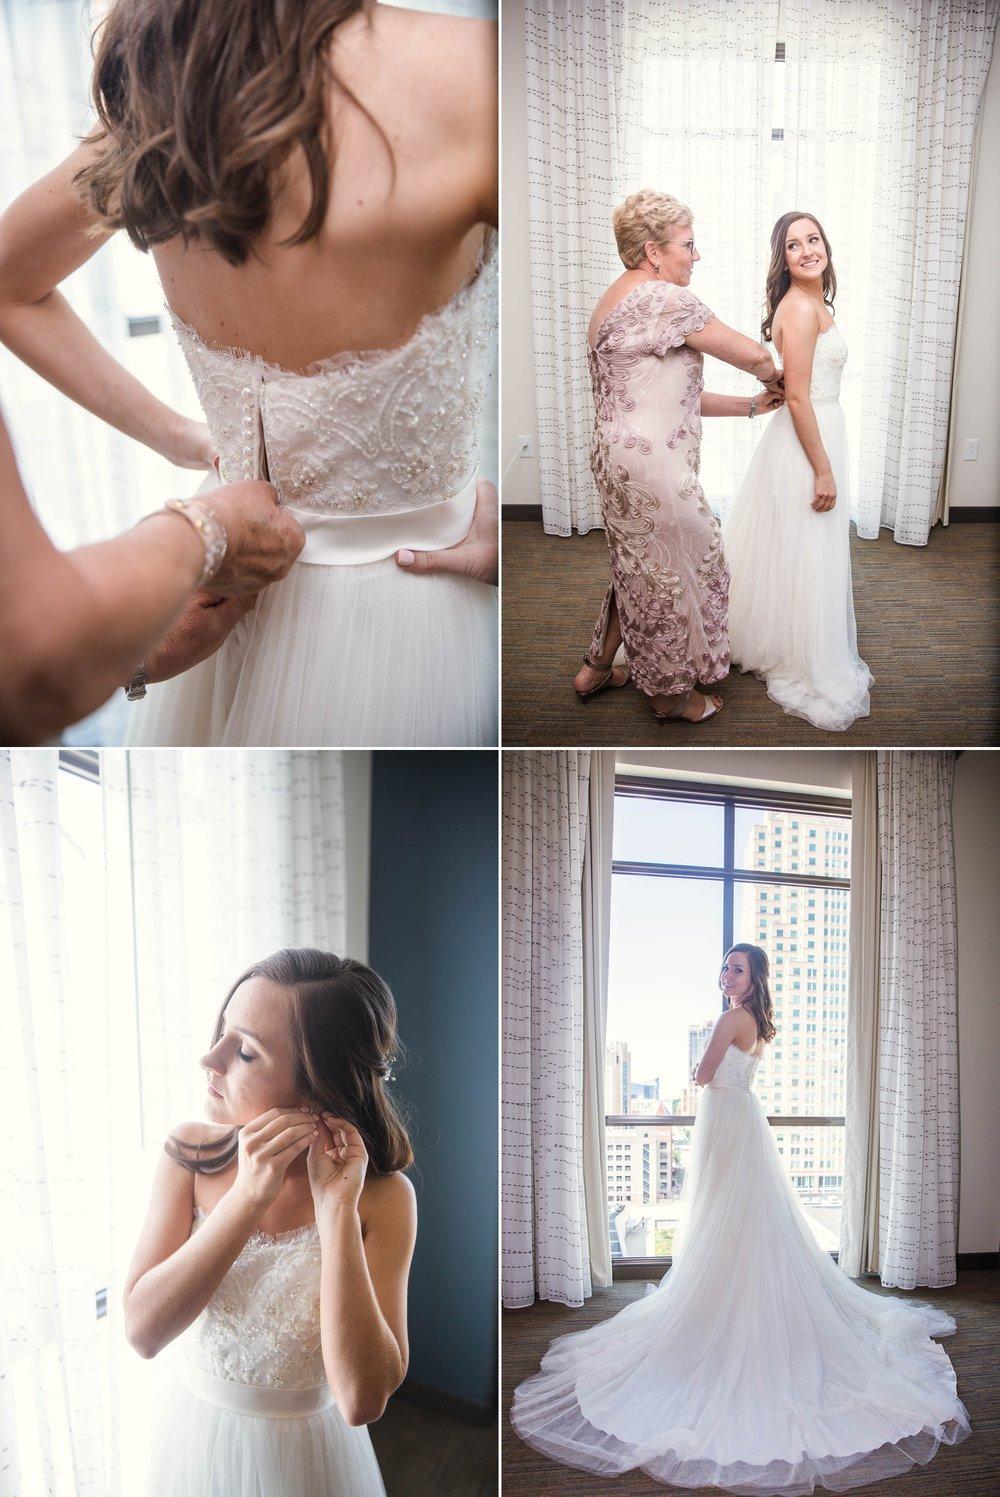 Elizabeth + Kane - Wedding at the Stockroom at 230 - Raleigh North Carolina Wedding Photographer 21.jpg